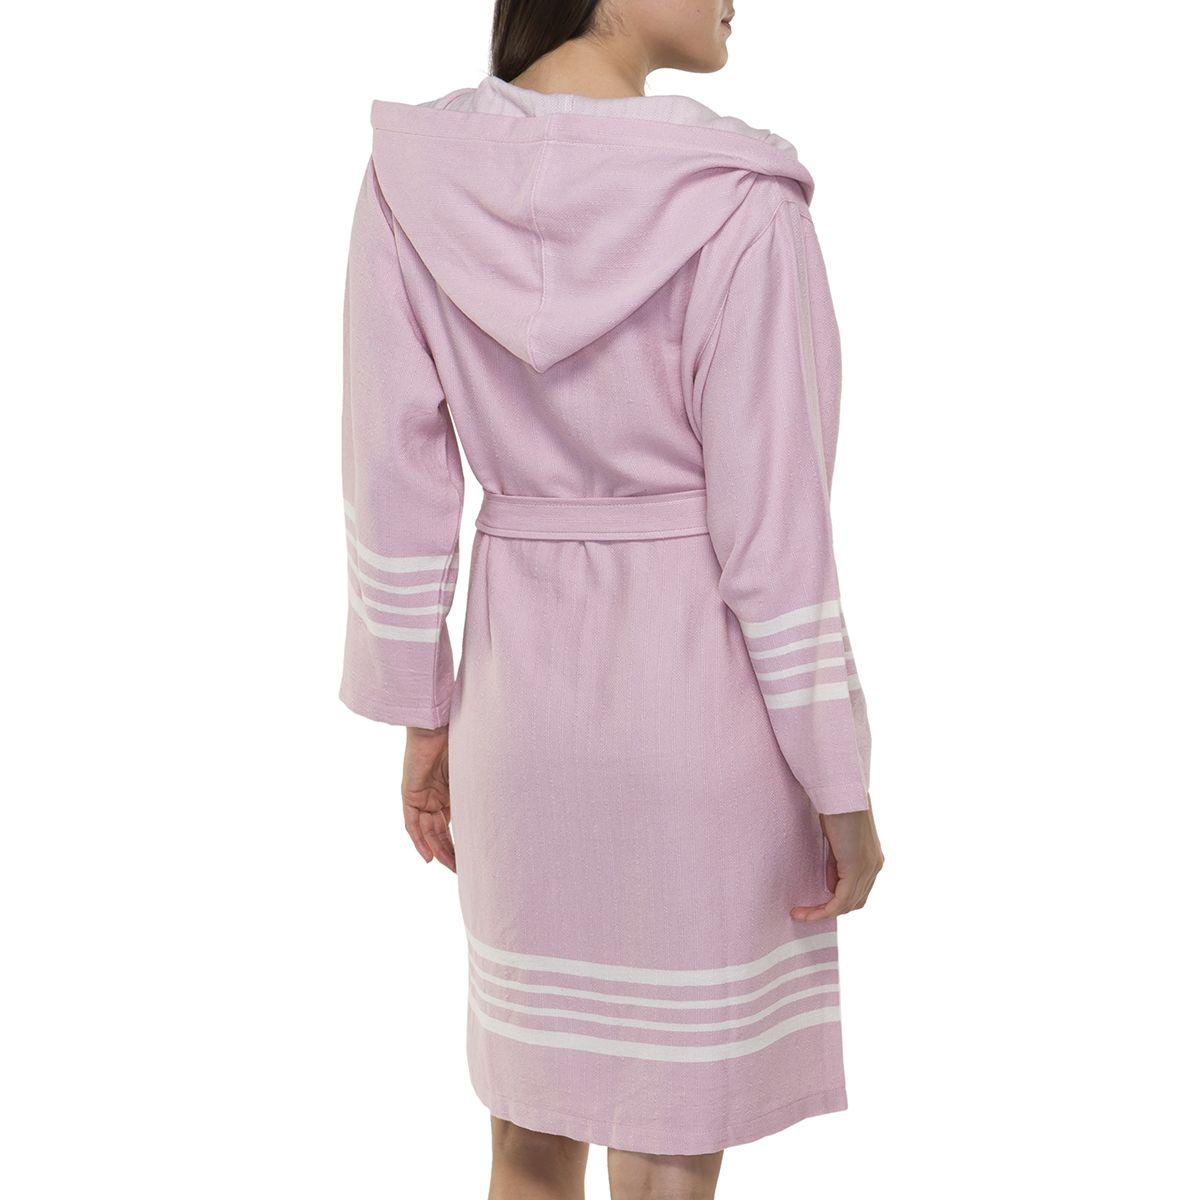 Bathrobe Sultan with hood - Rose Pink